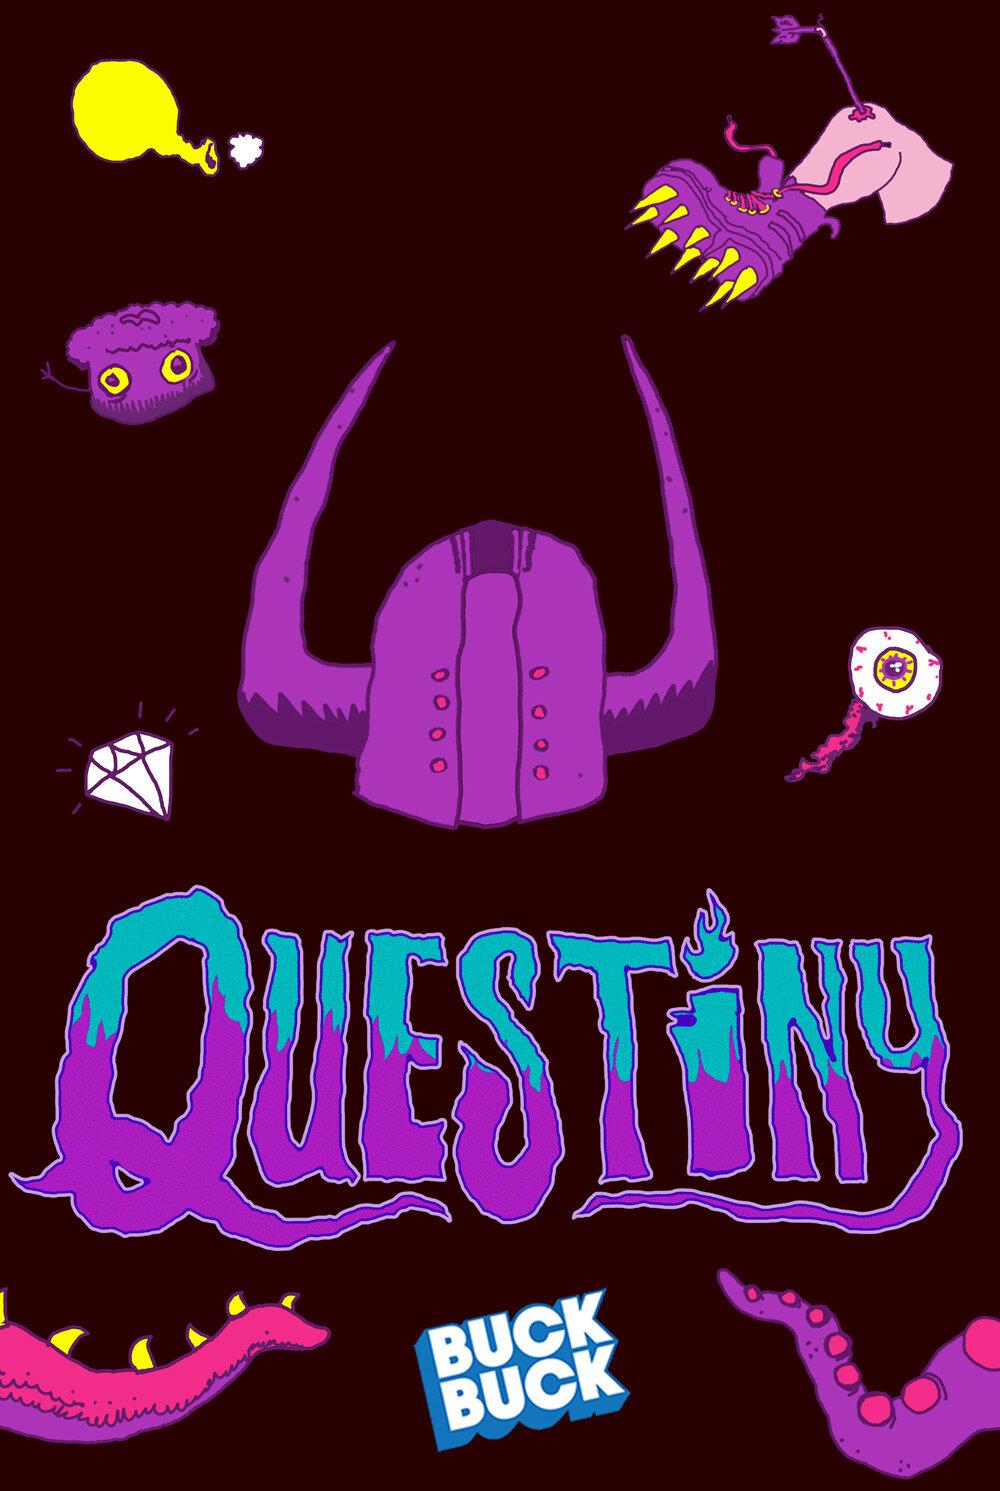 Questiny